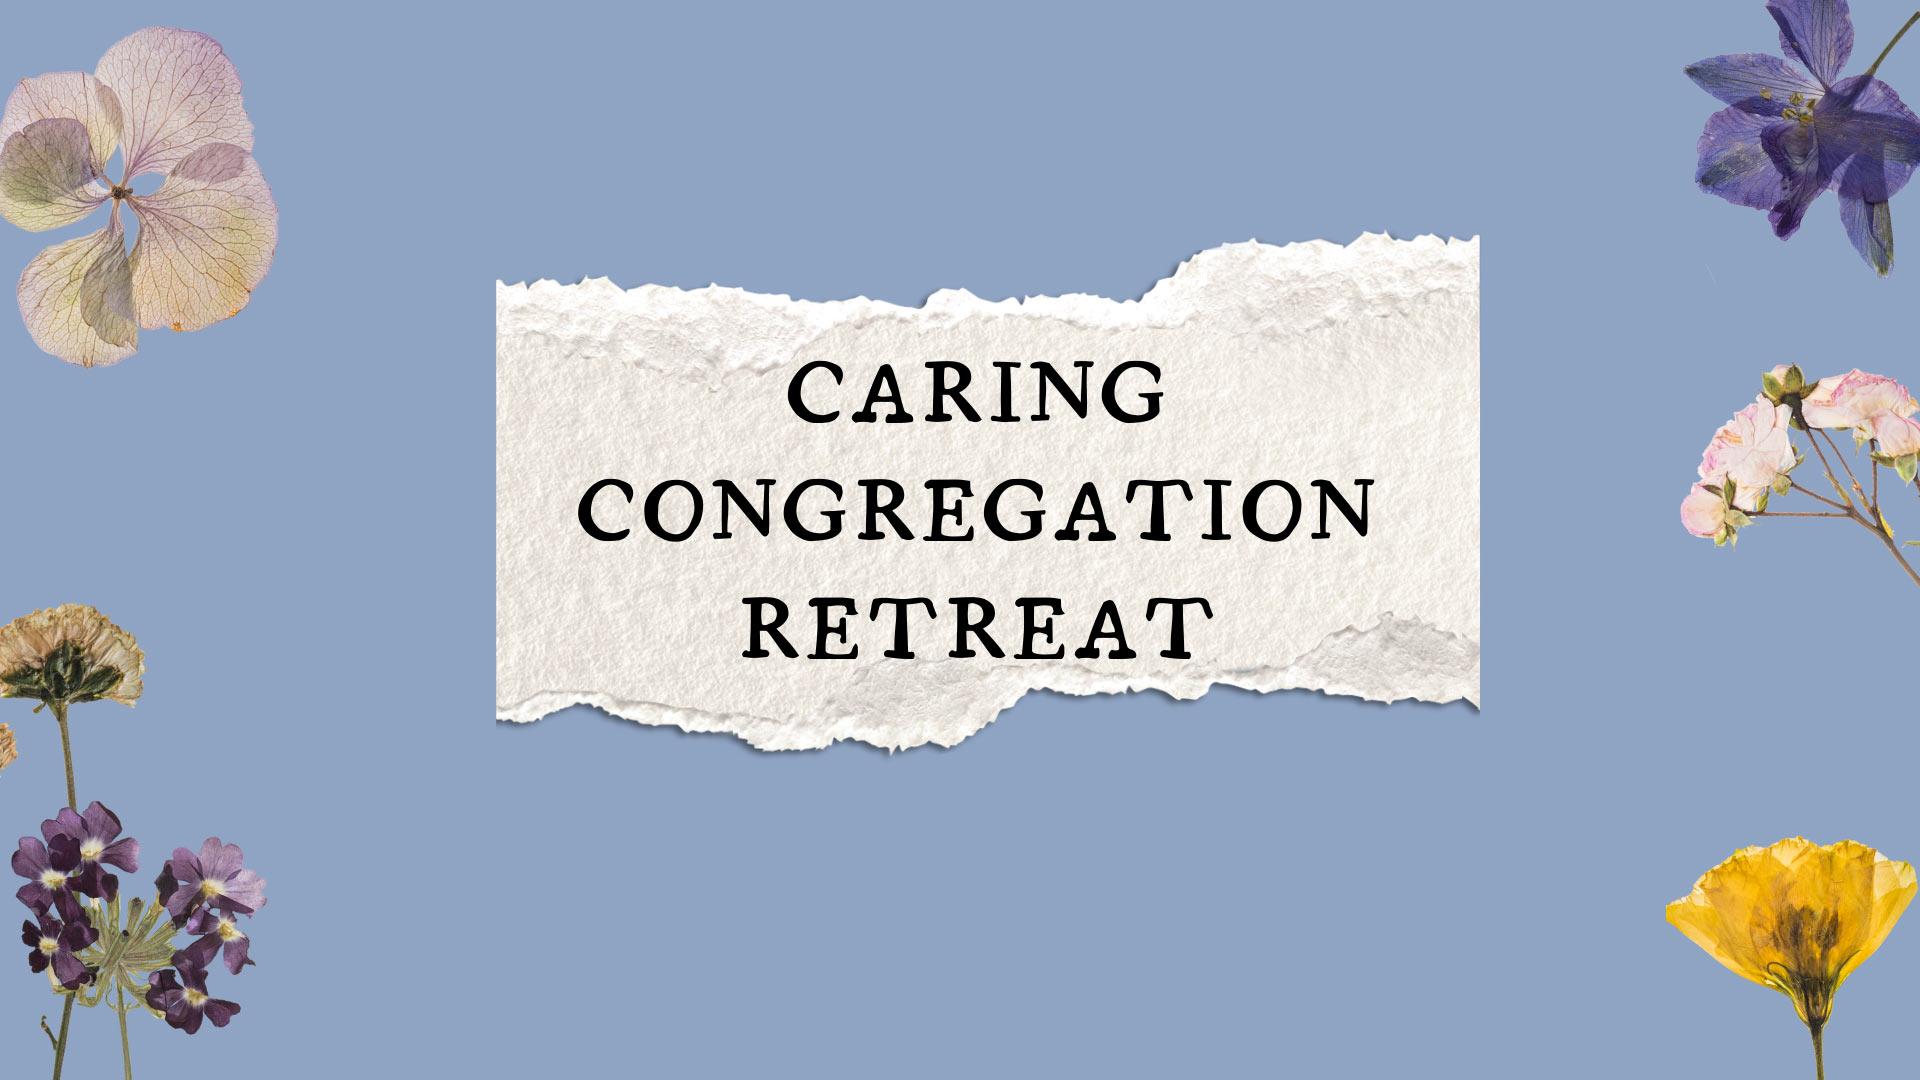 Caring Congregation Retreat